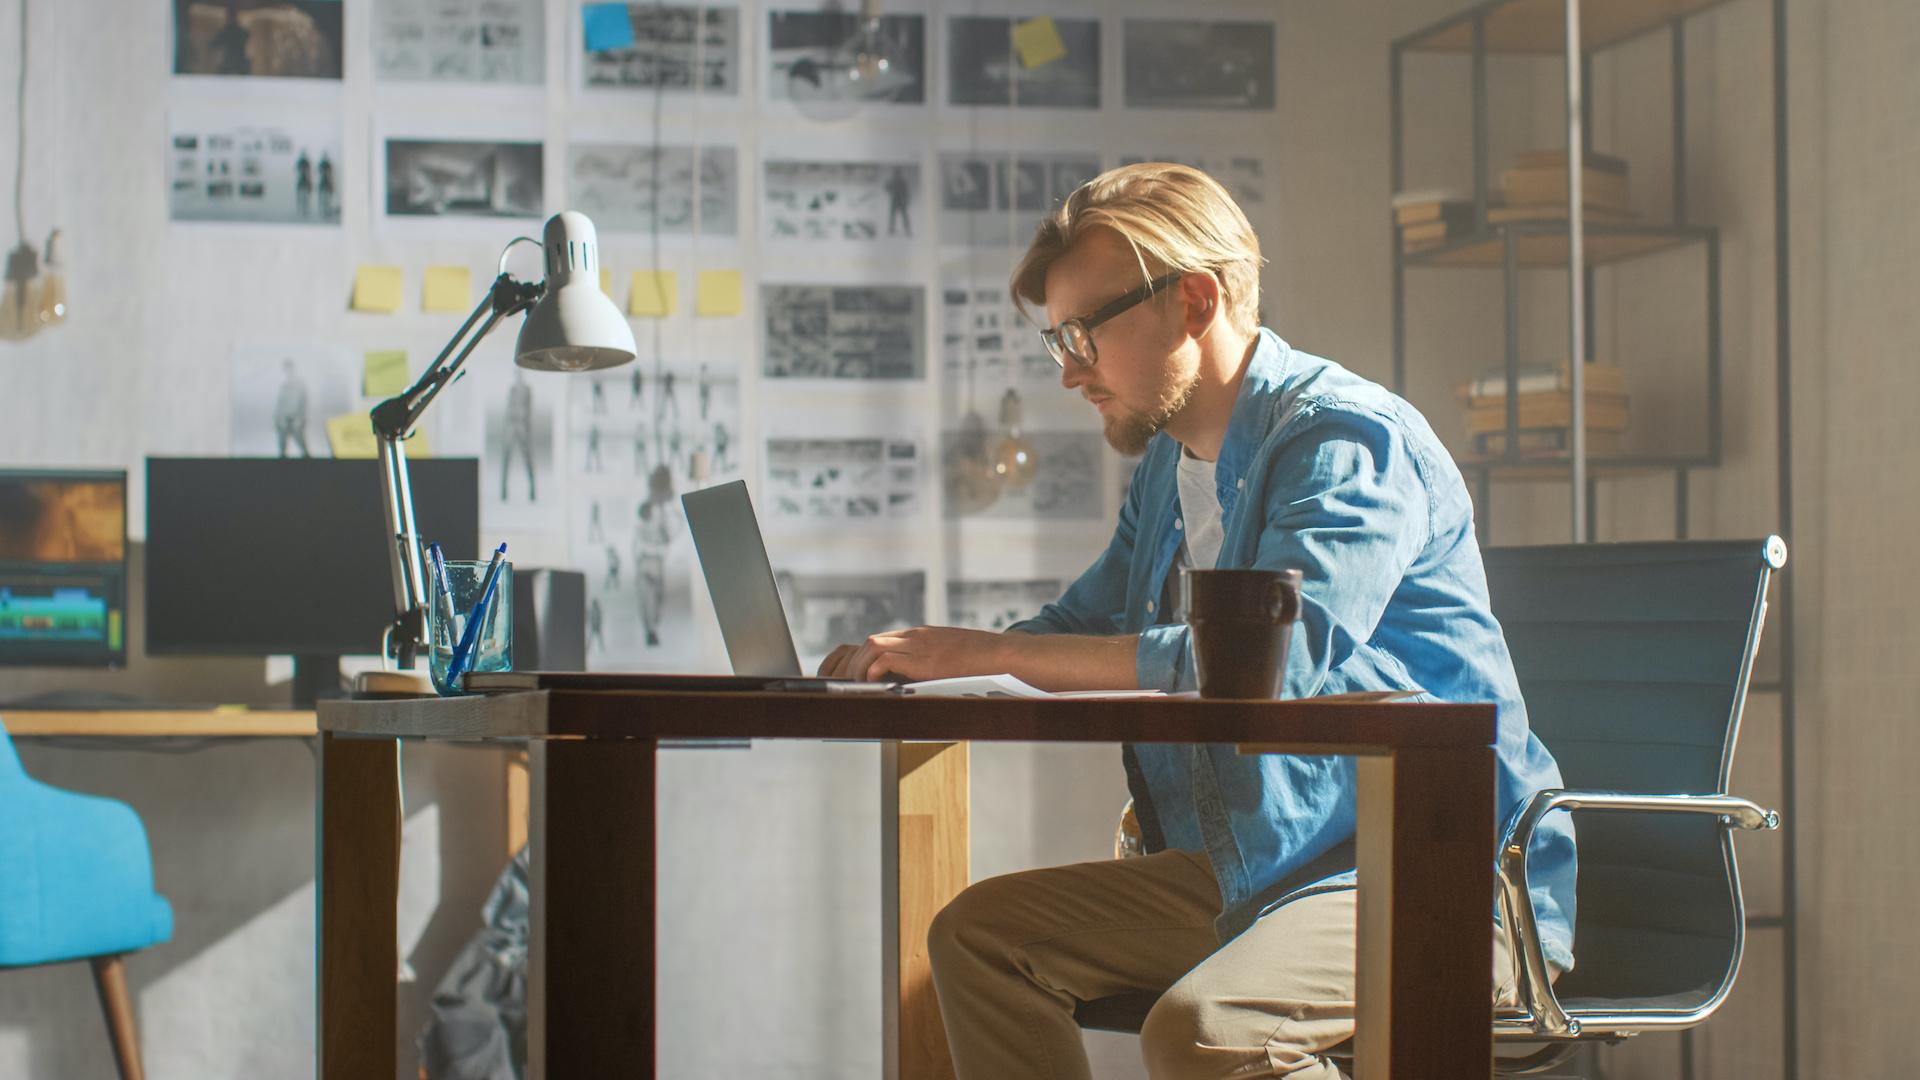 Photo: Gorodenkoff, Adobe Stock